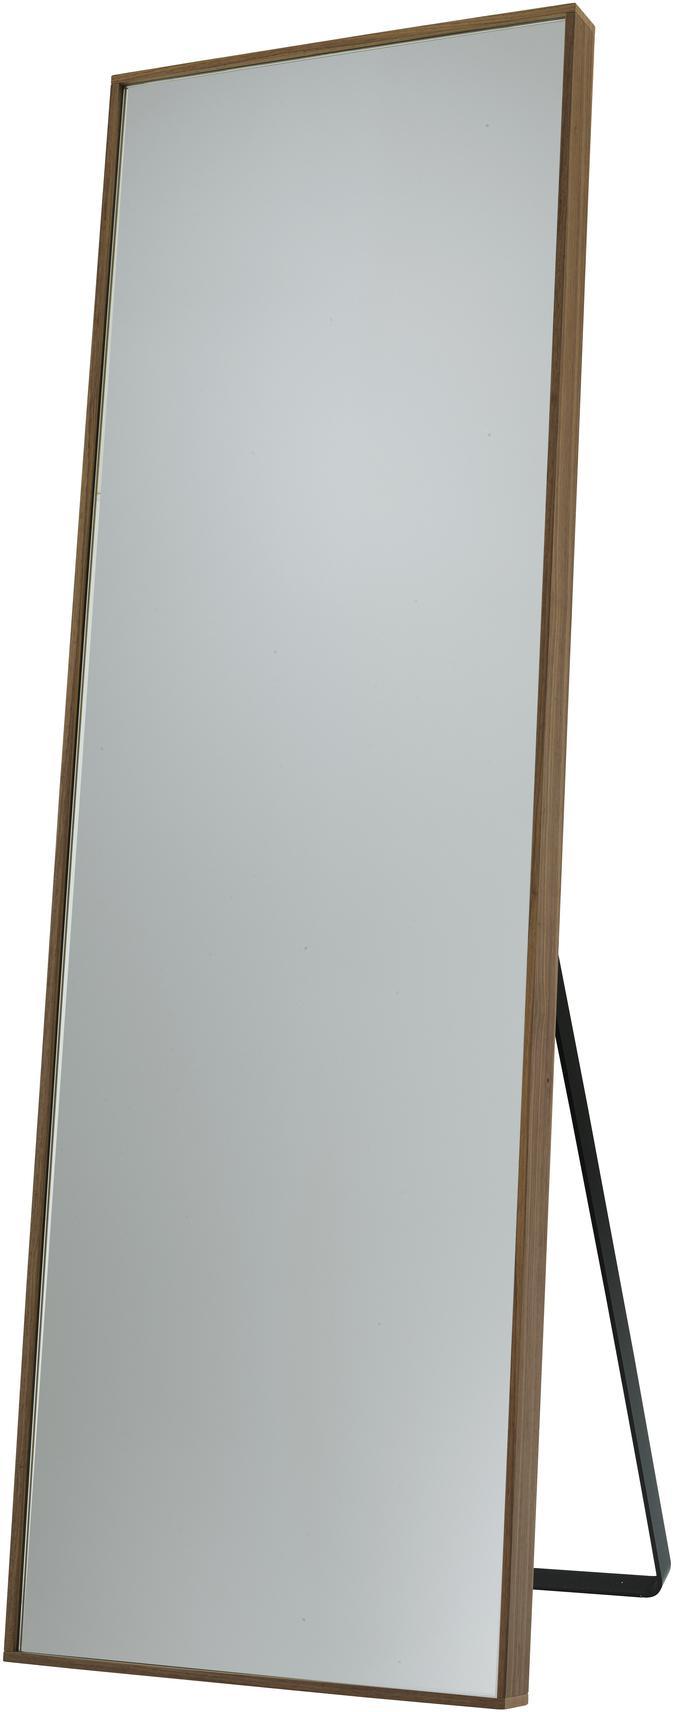 mirror evan entry from designer evangelos vasileiou. Black Bedroom Furniture Sets. Home Design Ideas